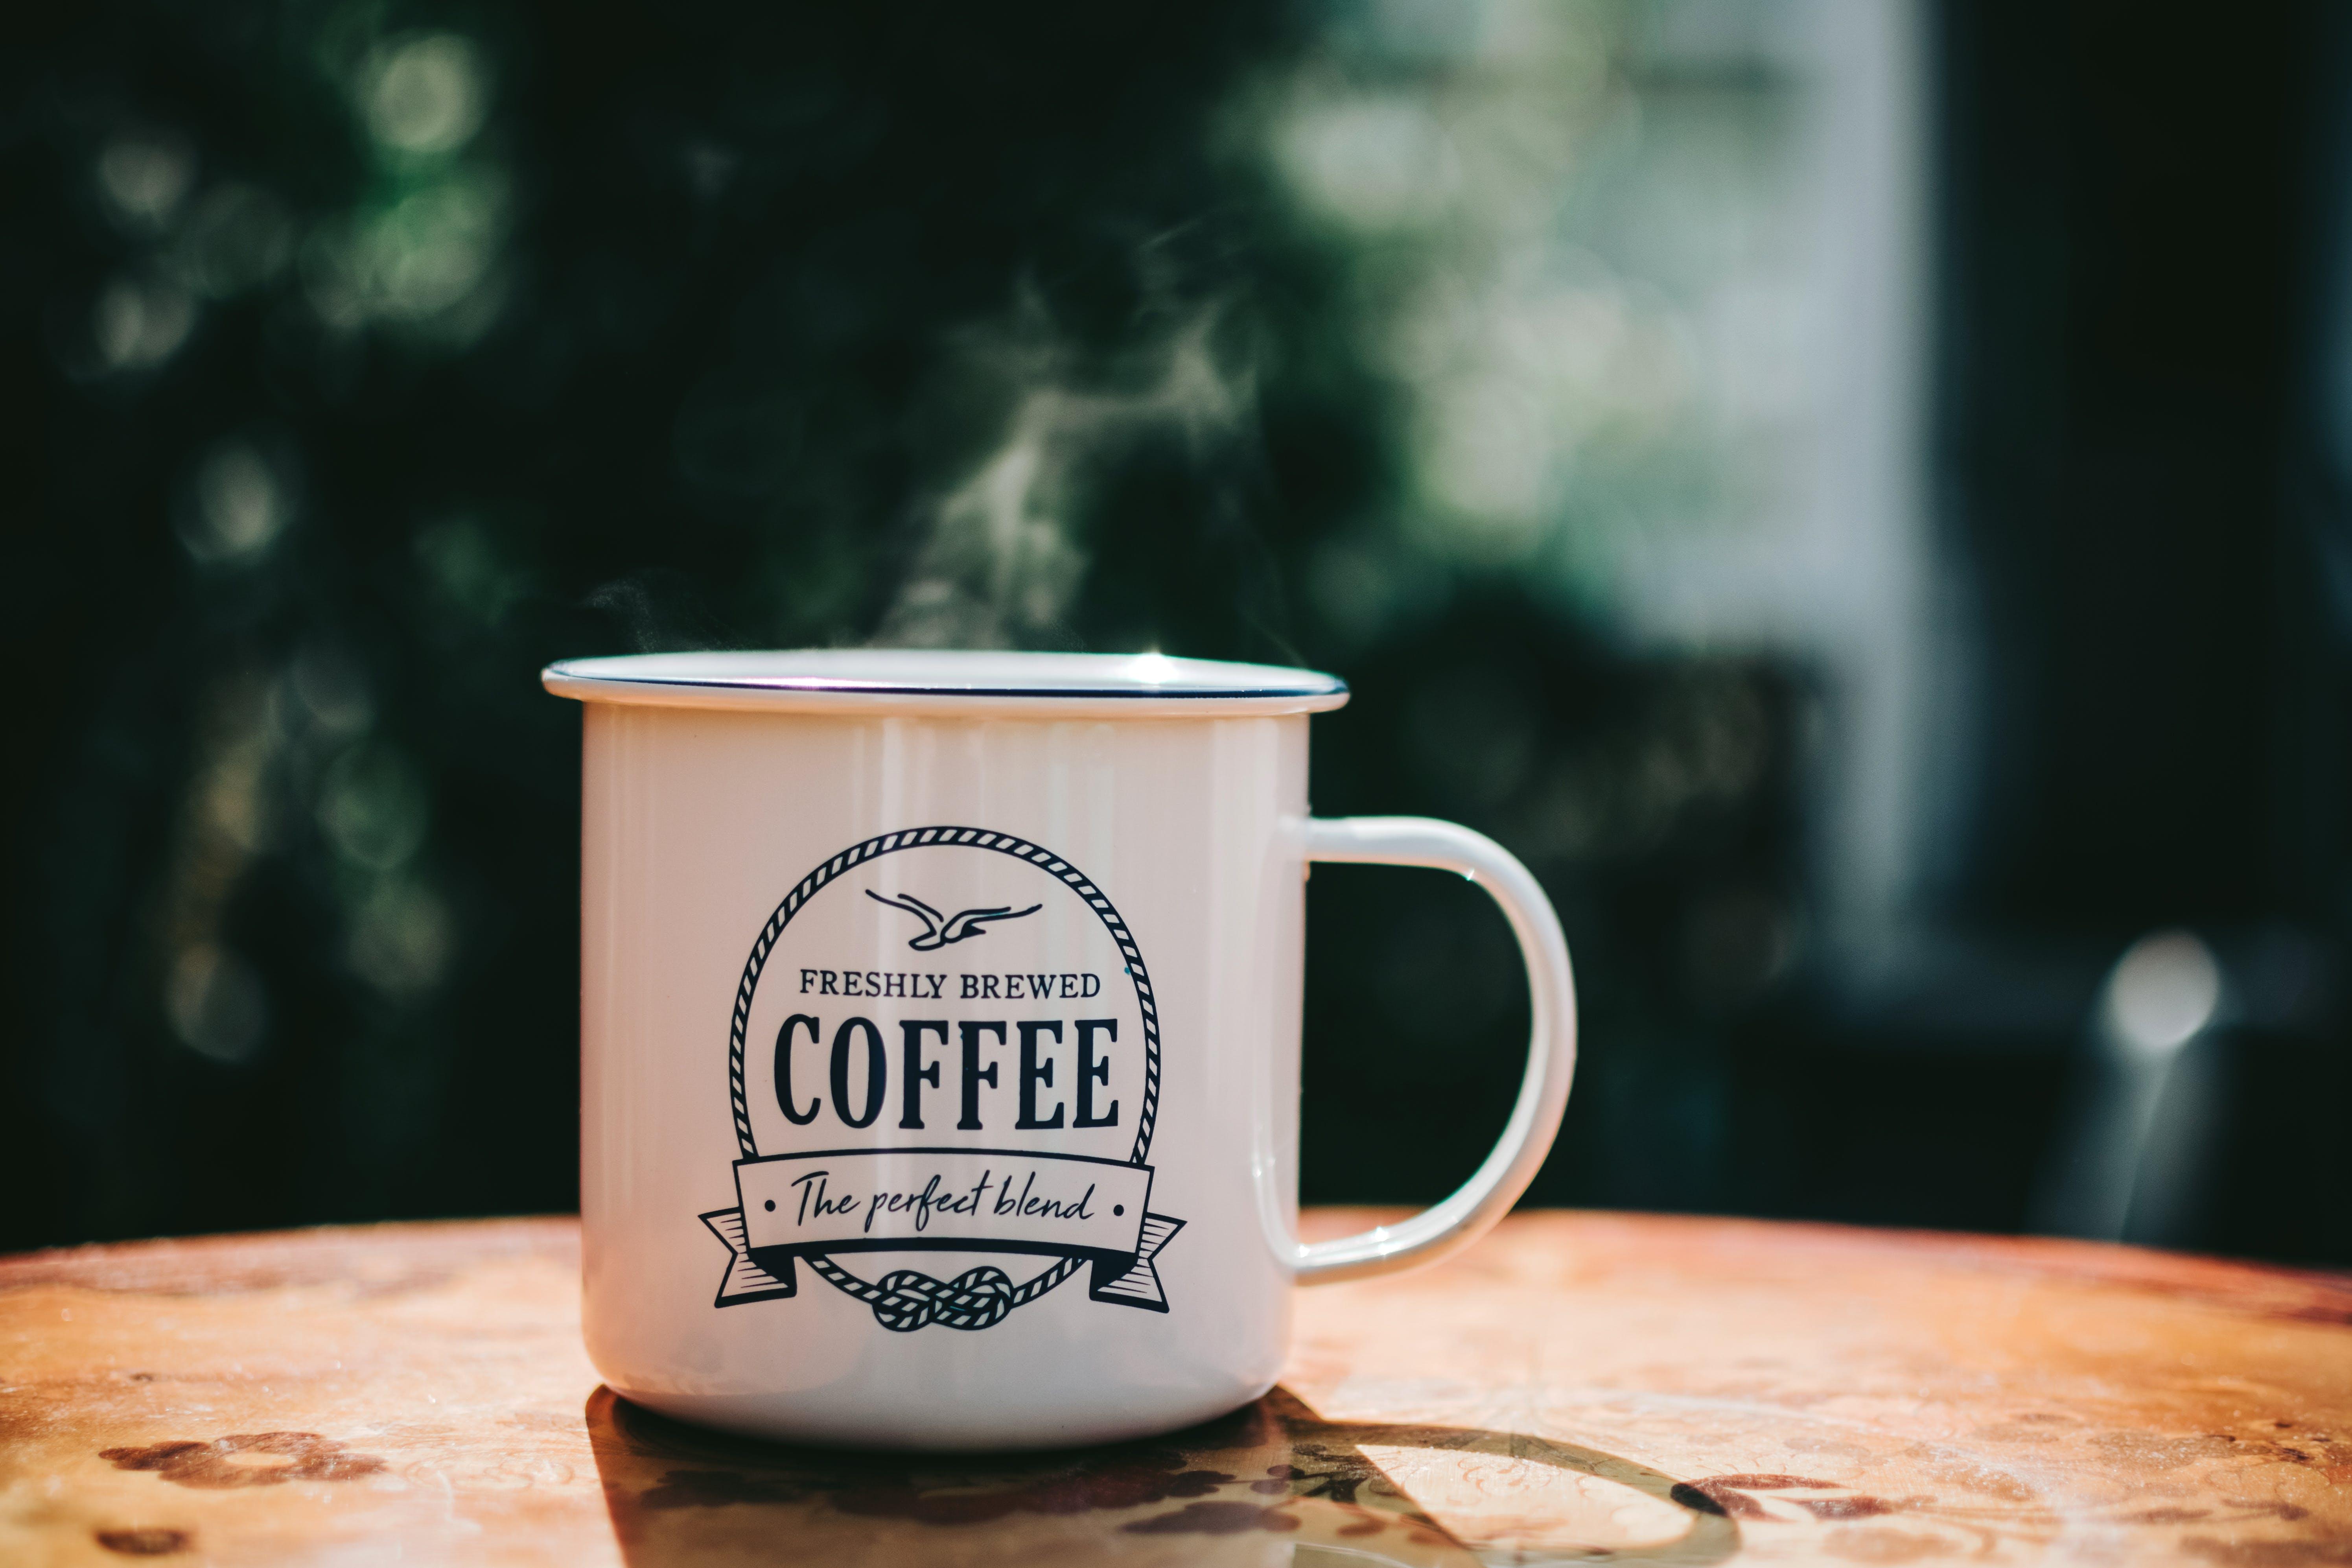 White Coffee Mug on Brown Surface